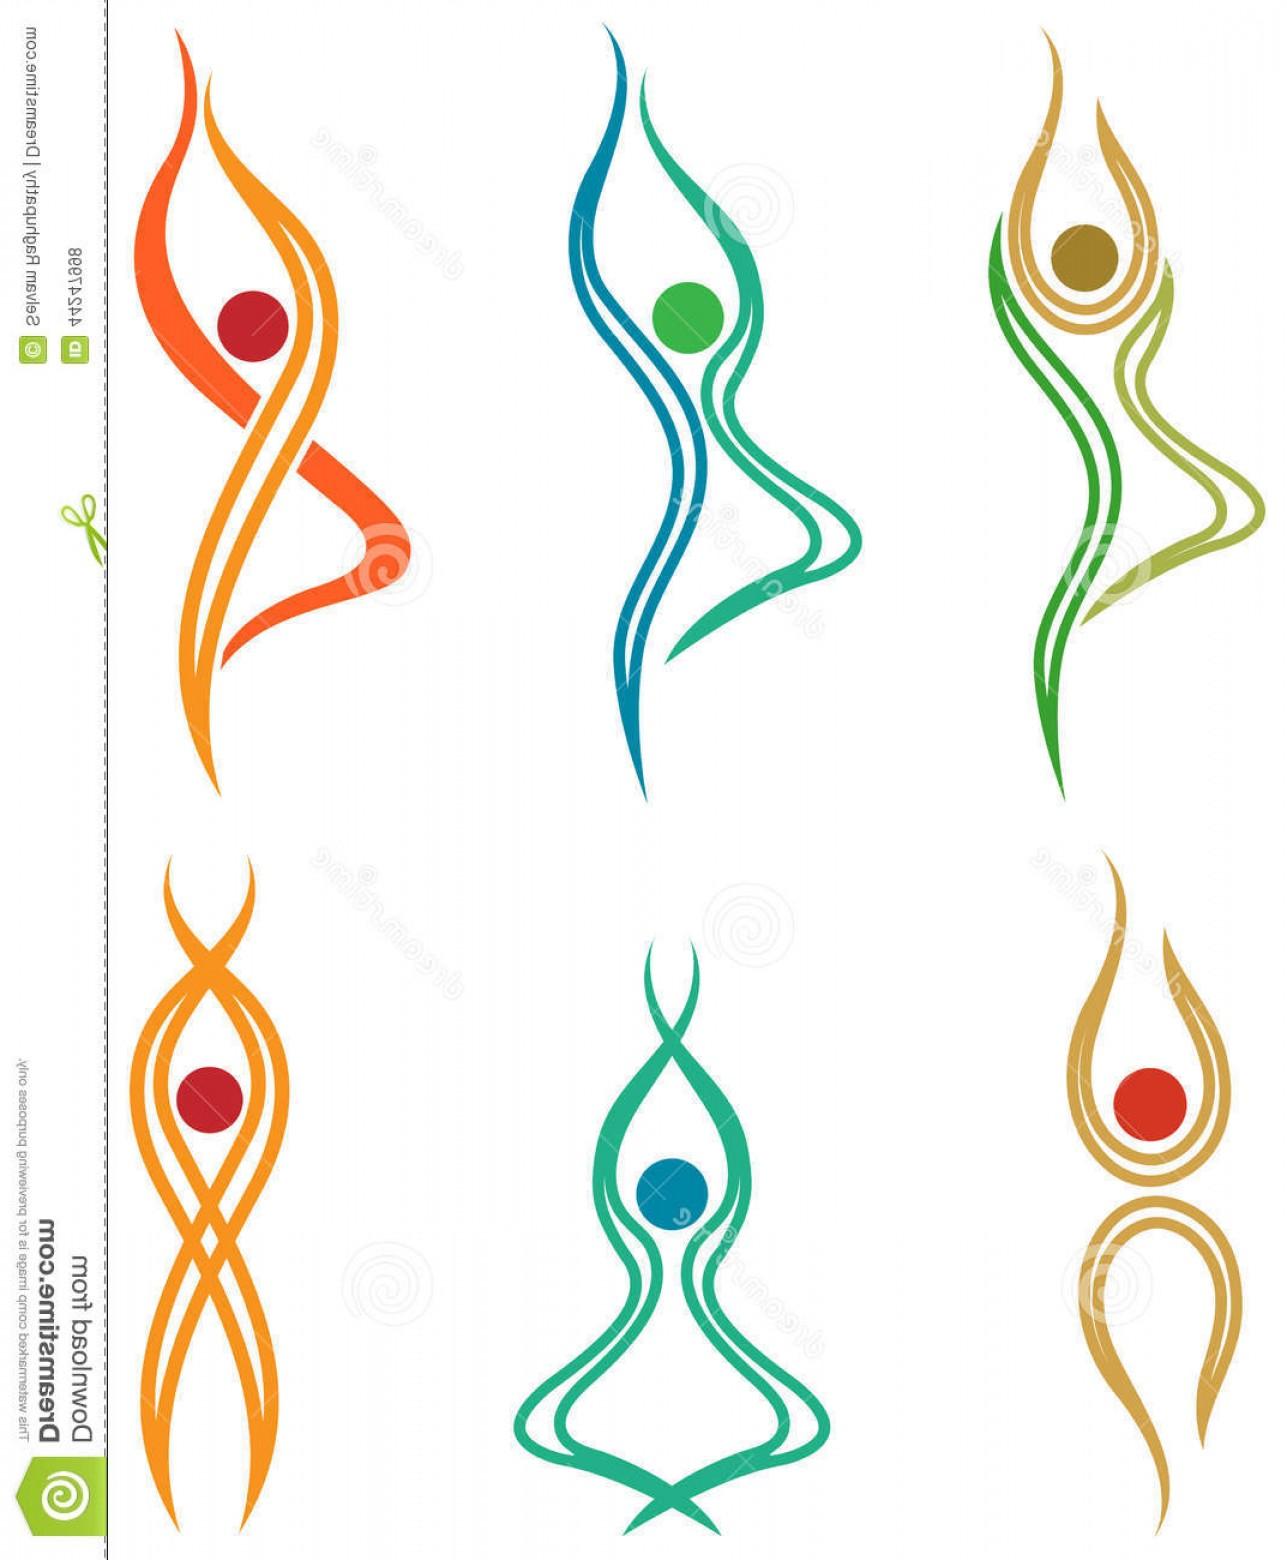 1287x1560 Stock Illustration Abstract Yoga Symbols Line Art Symbol Set